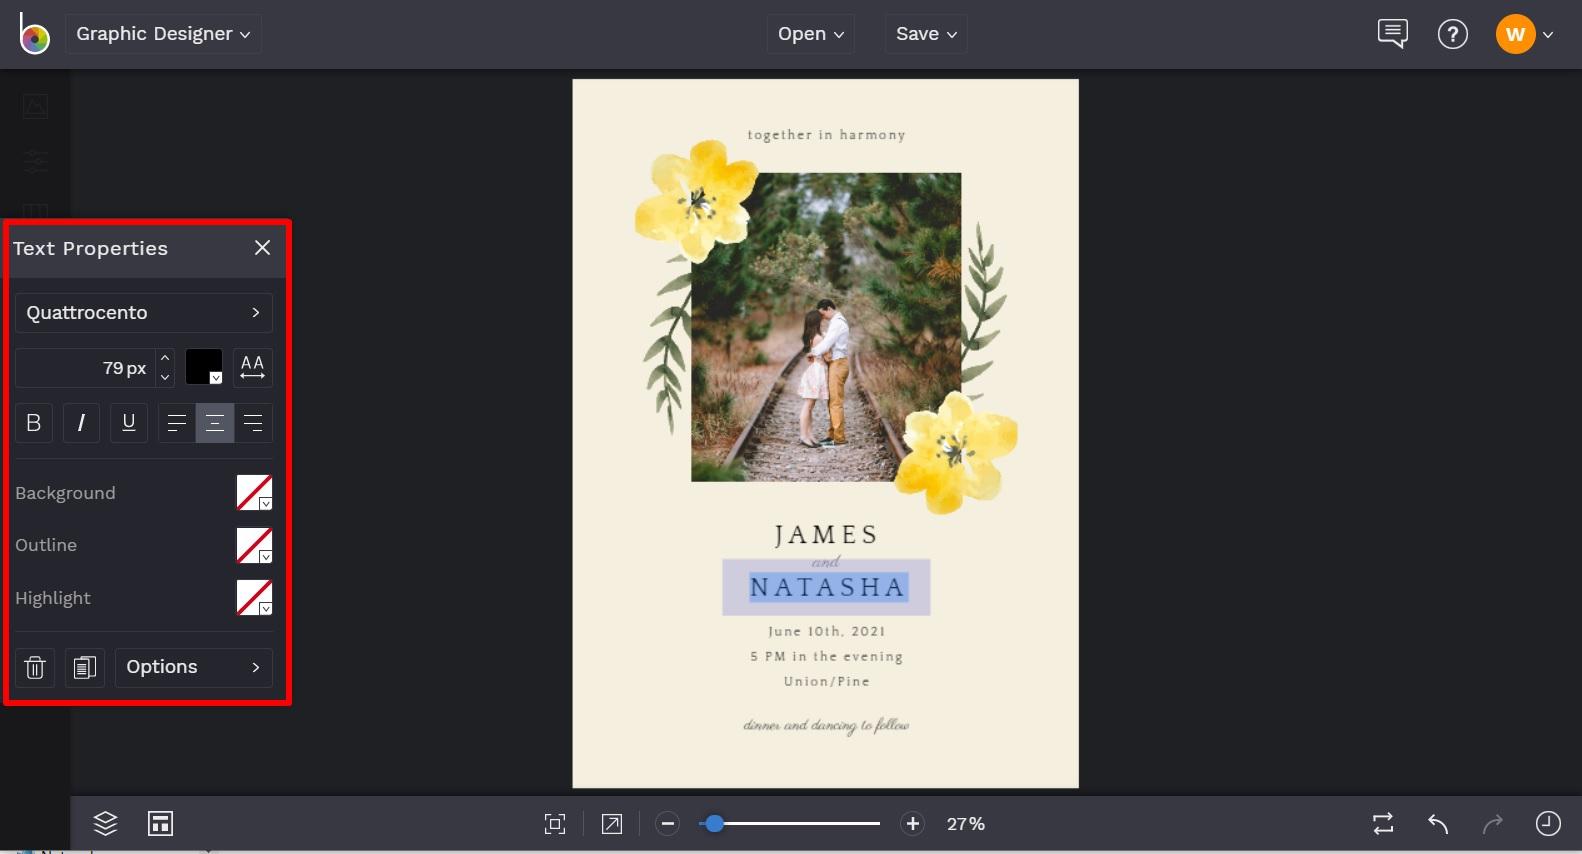 customizable wedding invitation templates by BeFunky